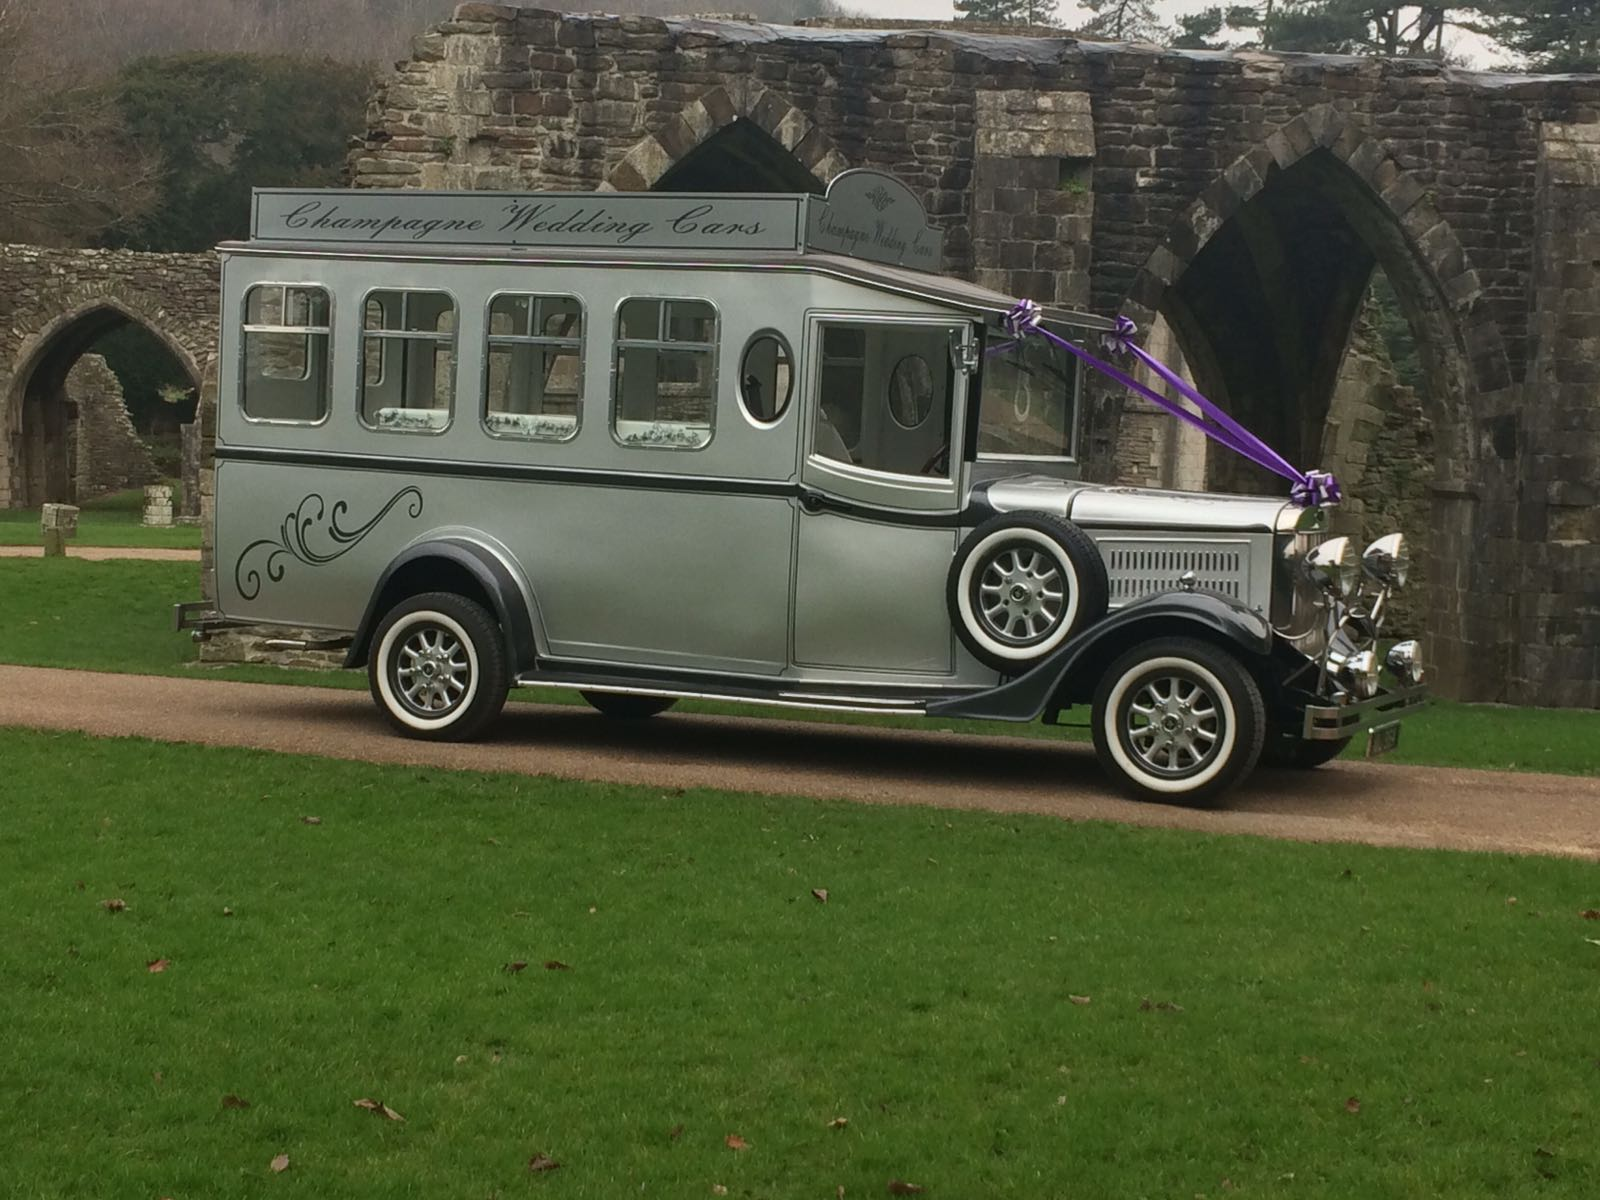 Maurice Wedding Car Side View